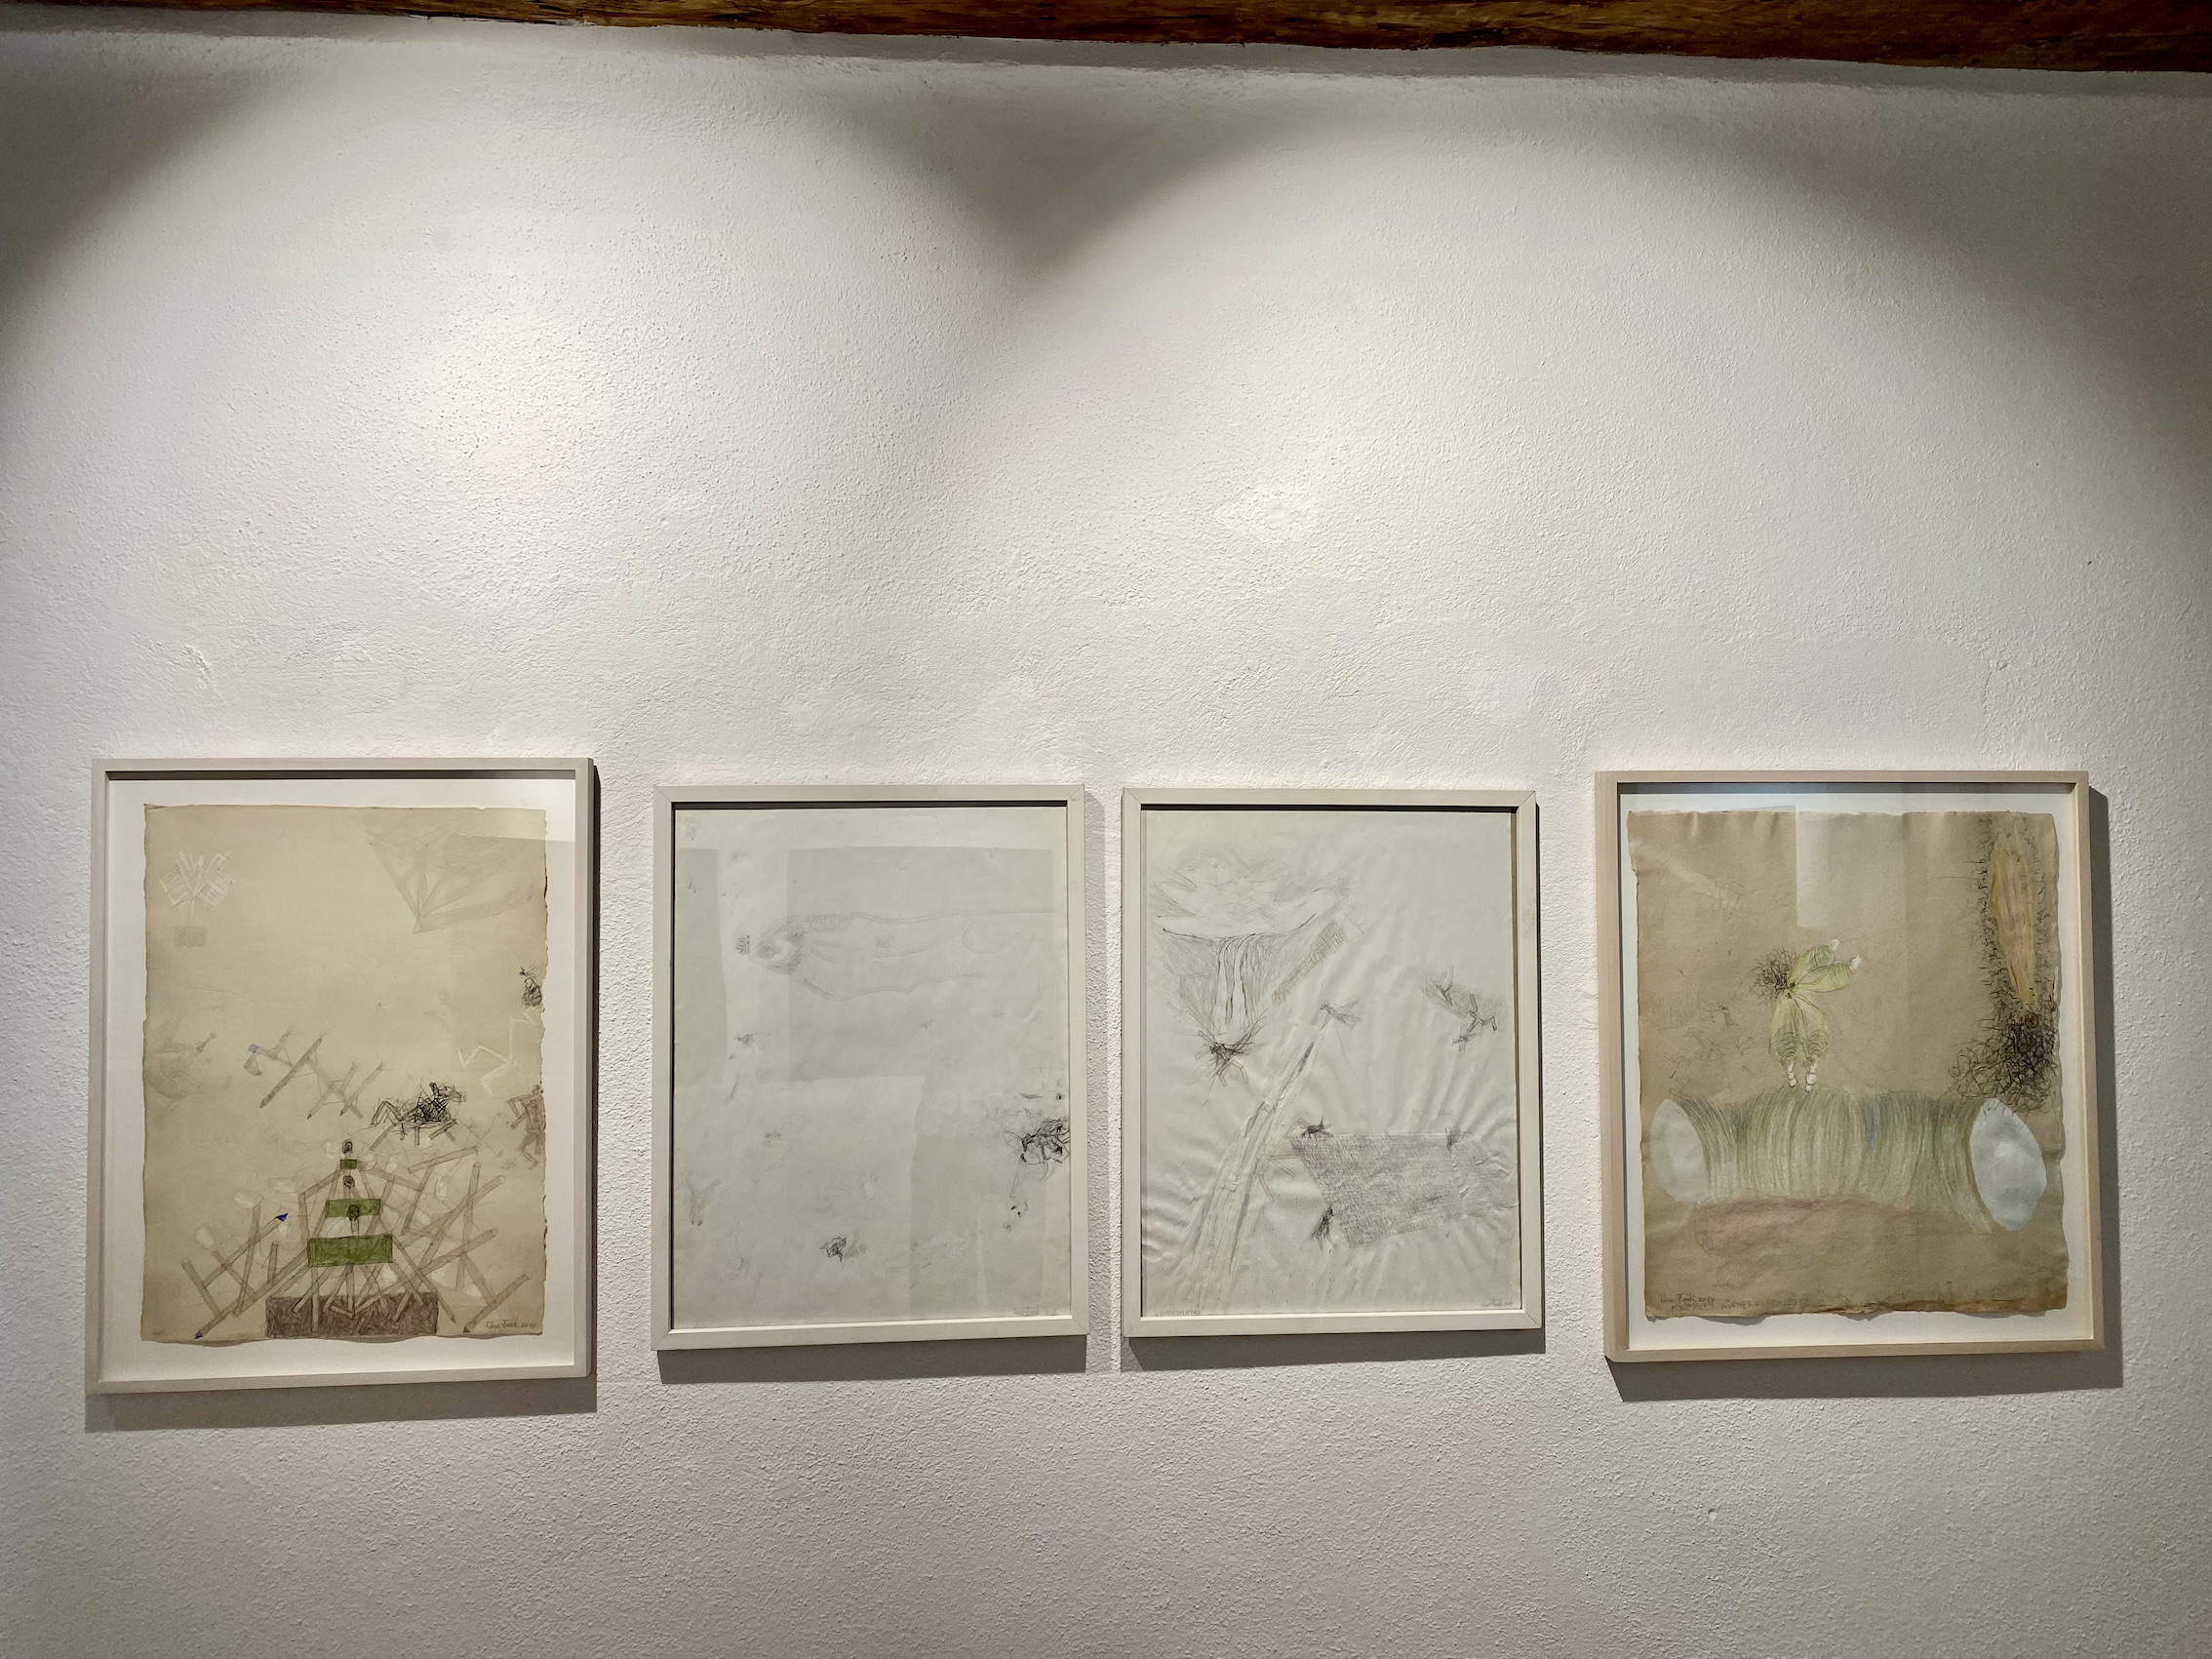 Tone Fink_Ausstellung_Galerie Frank Wien